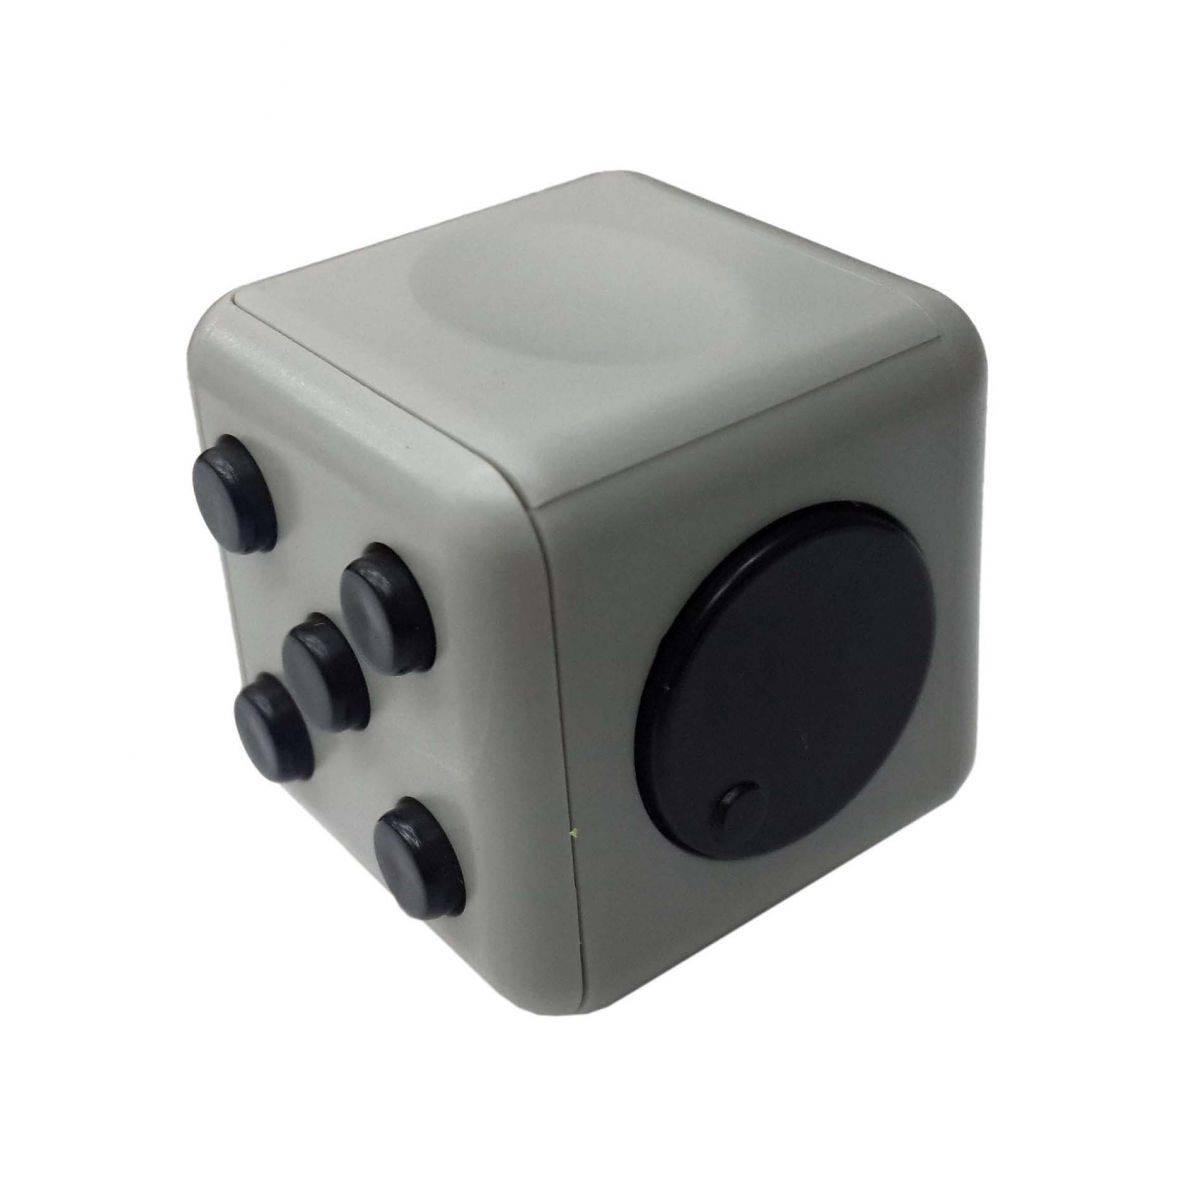 2Fidget Cubo Para Ansiedade Cube Spinner Anti Estresse Dedo Apertar Para Toc Cinza (BSL-GIRA-3)